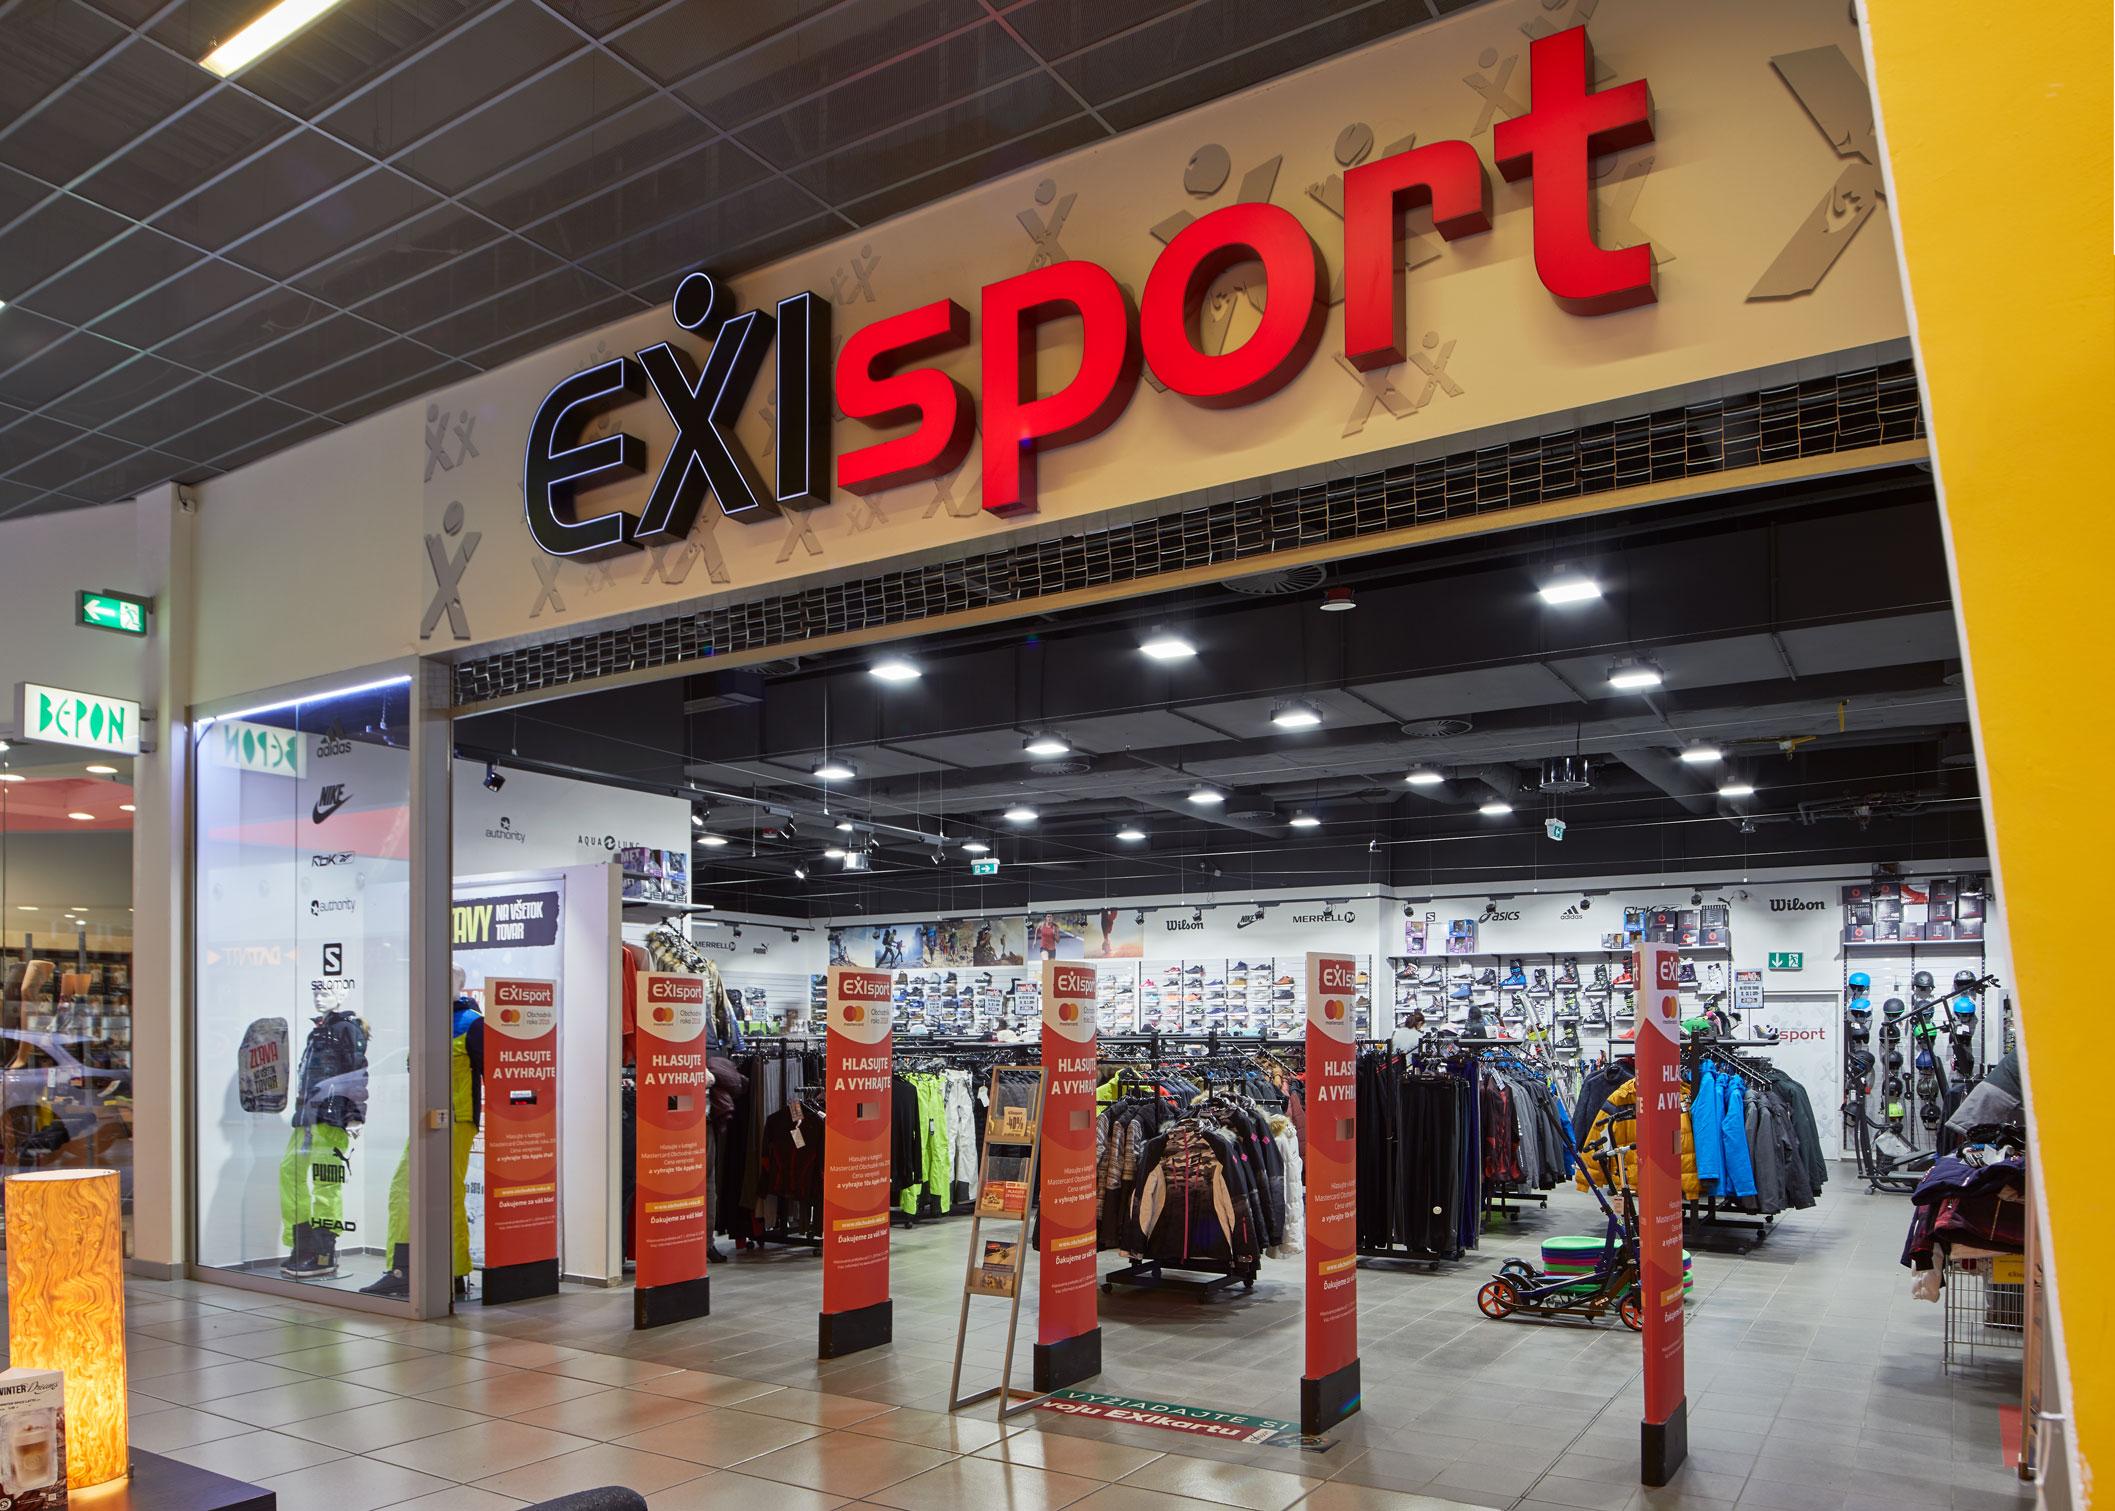 Exisport - Montel